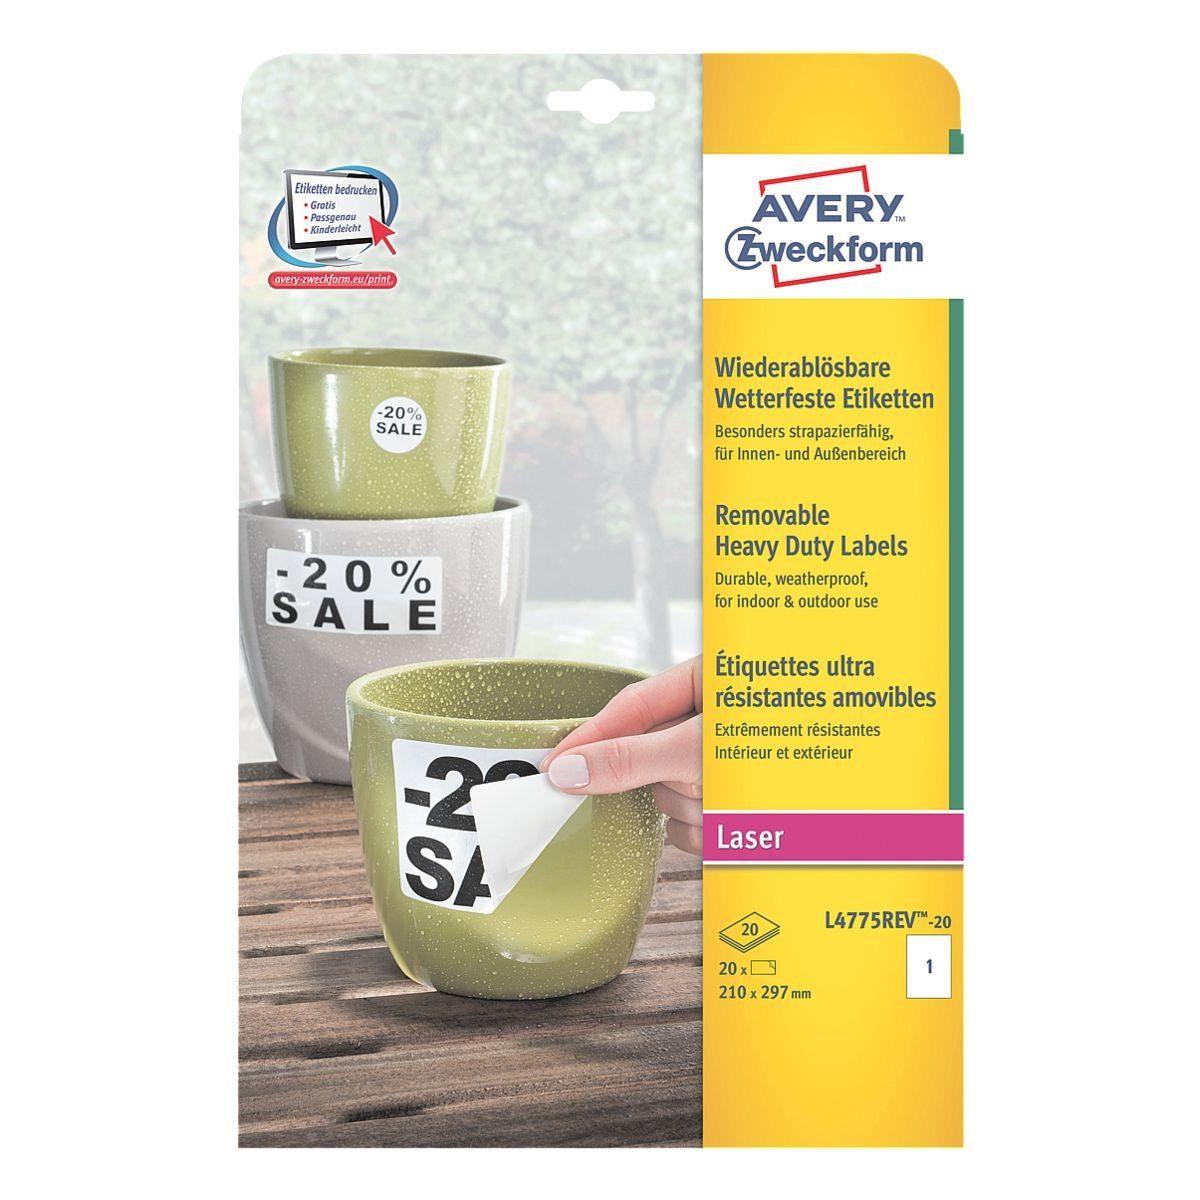 ZWECKFORMAVERY 20er-Pack Folien-Etiketten »L4775REV-20«